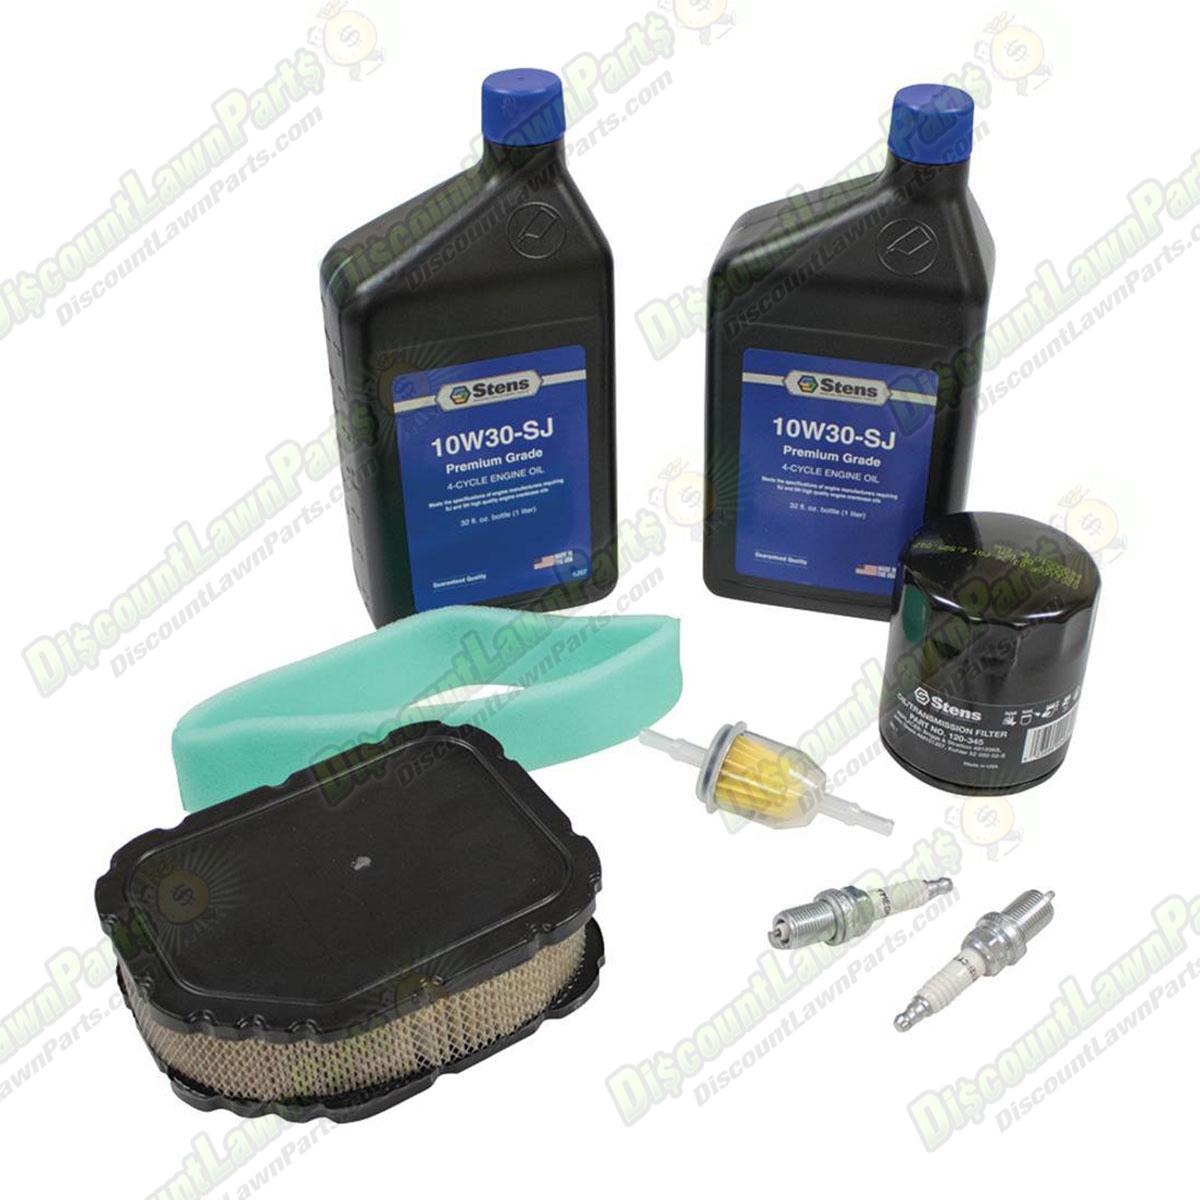 Engine Maintenance Kit / Kohler 32 789 01-S Replacement Engine Maintenance  Kit / Stens 785-616